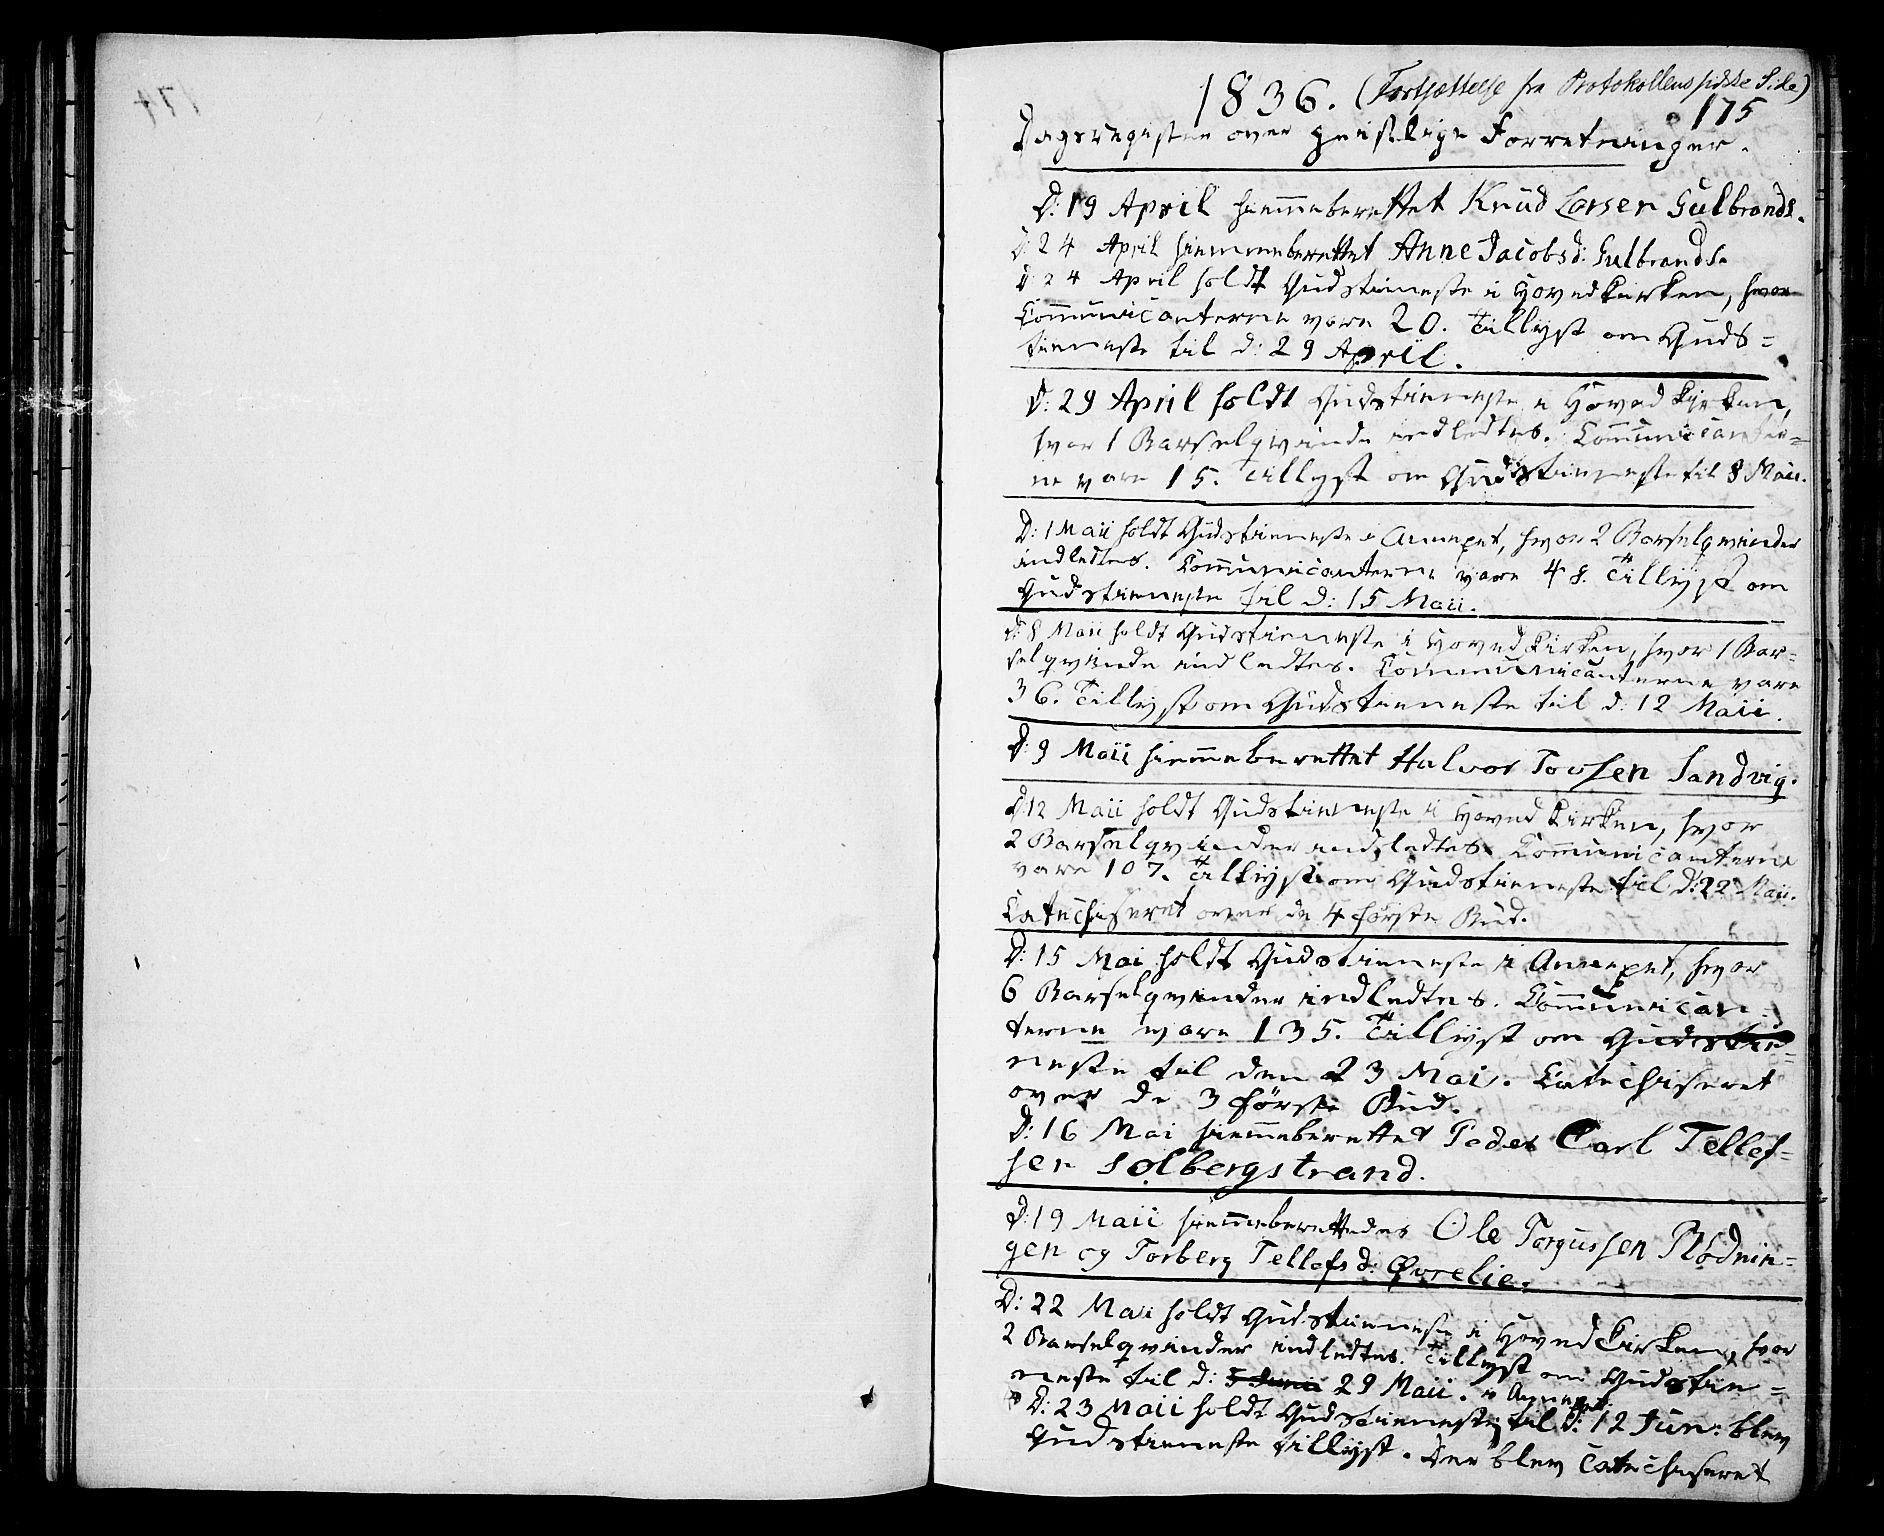 SAKO, Drangedal kirkebøker, F/Fa/L0006: Ministerialbok nr. 6, 1831-1837, s. 175